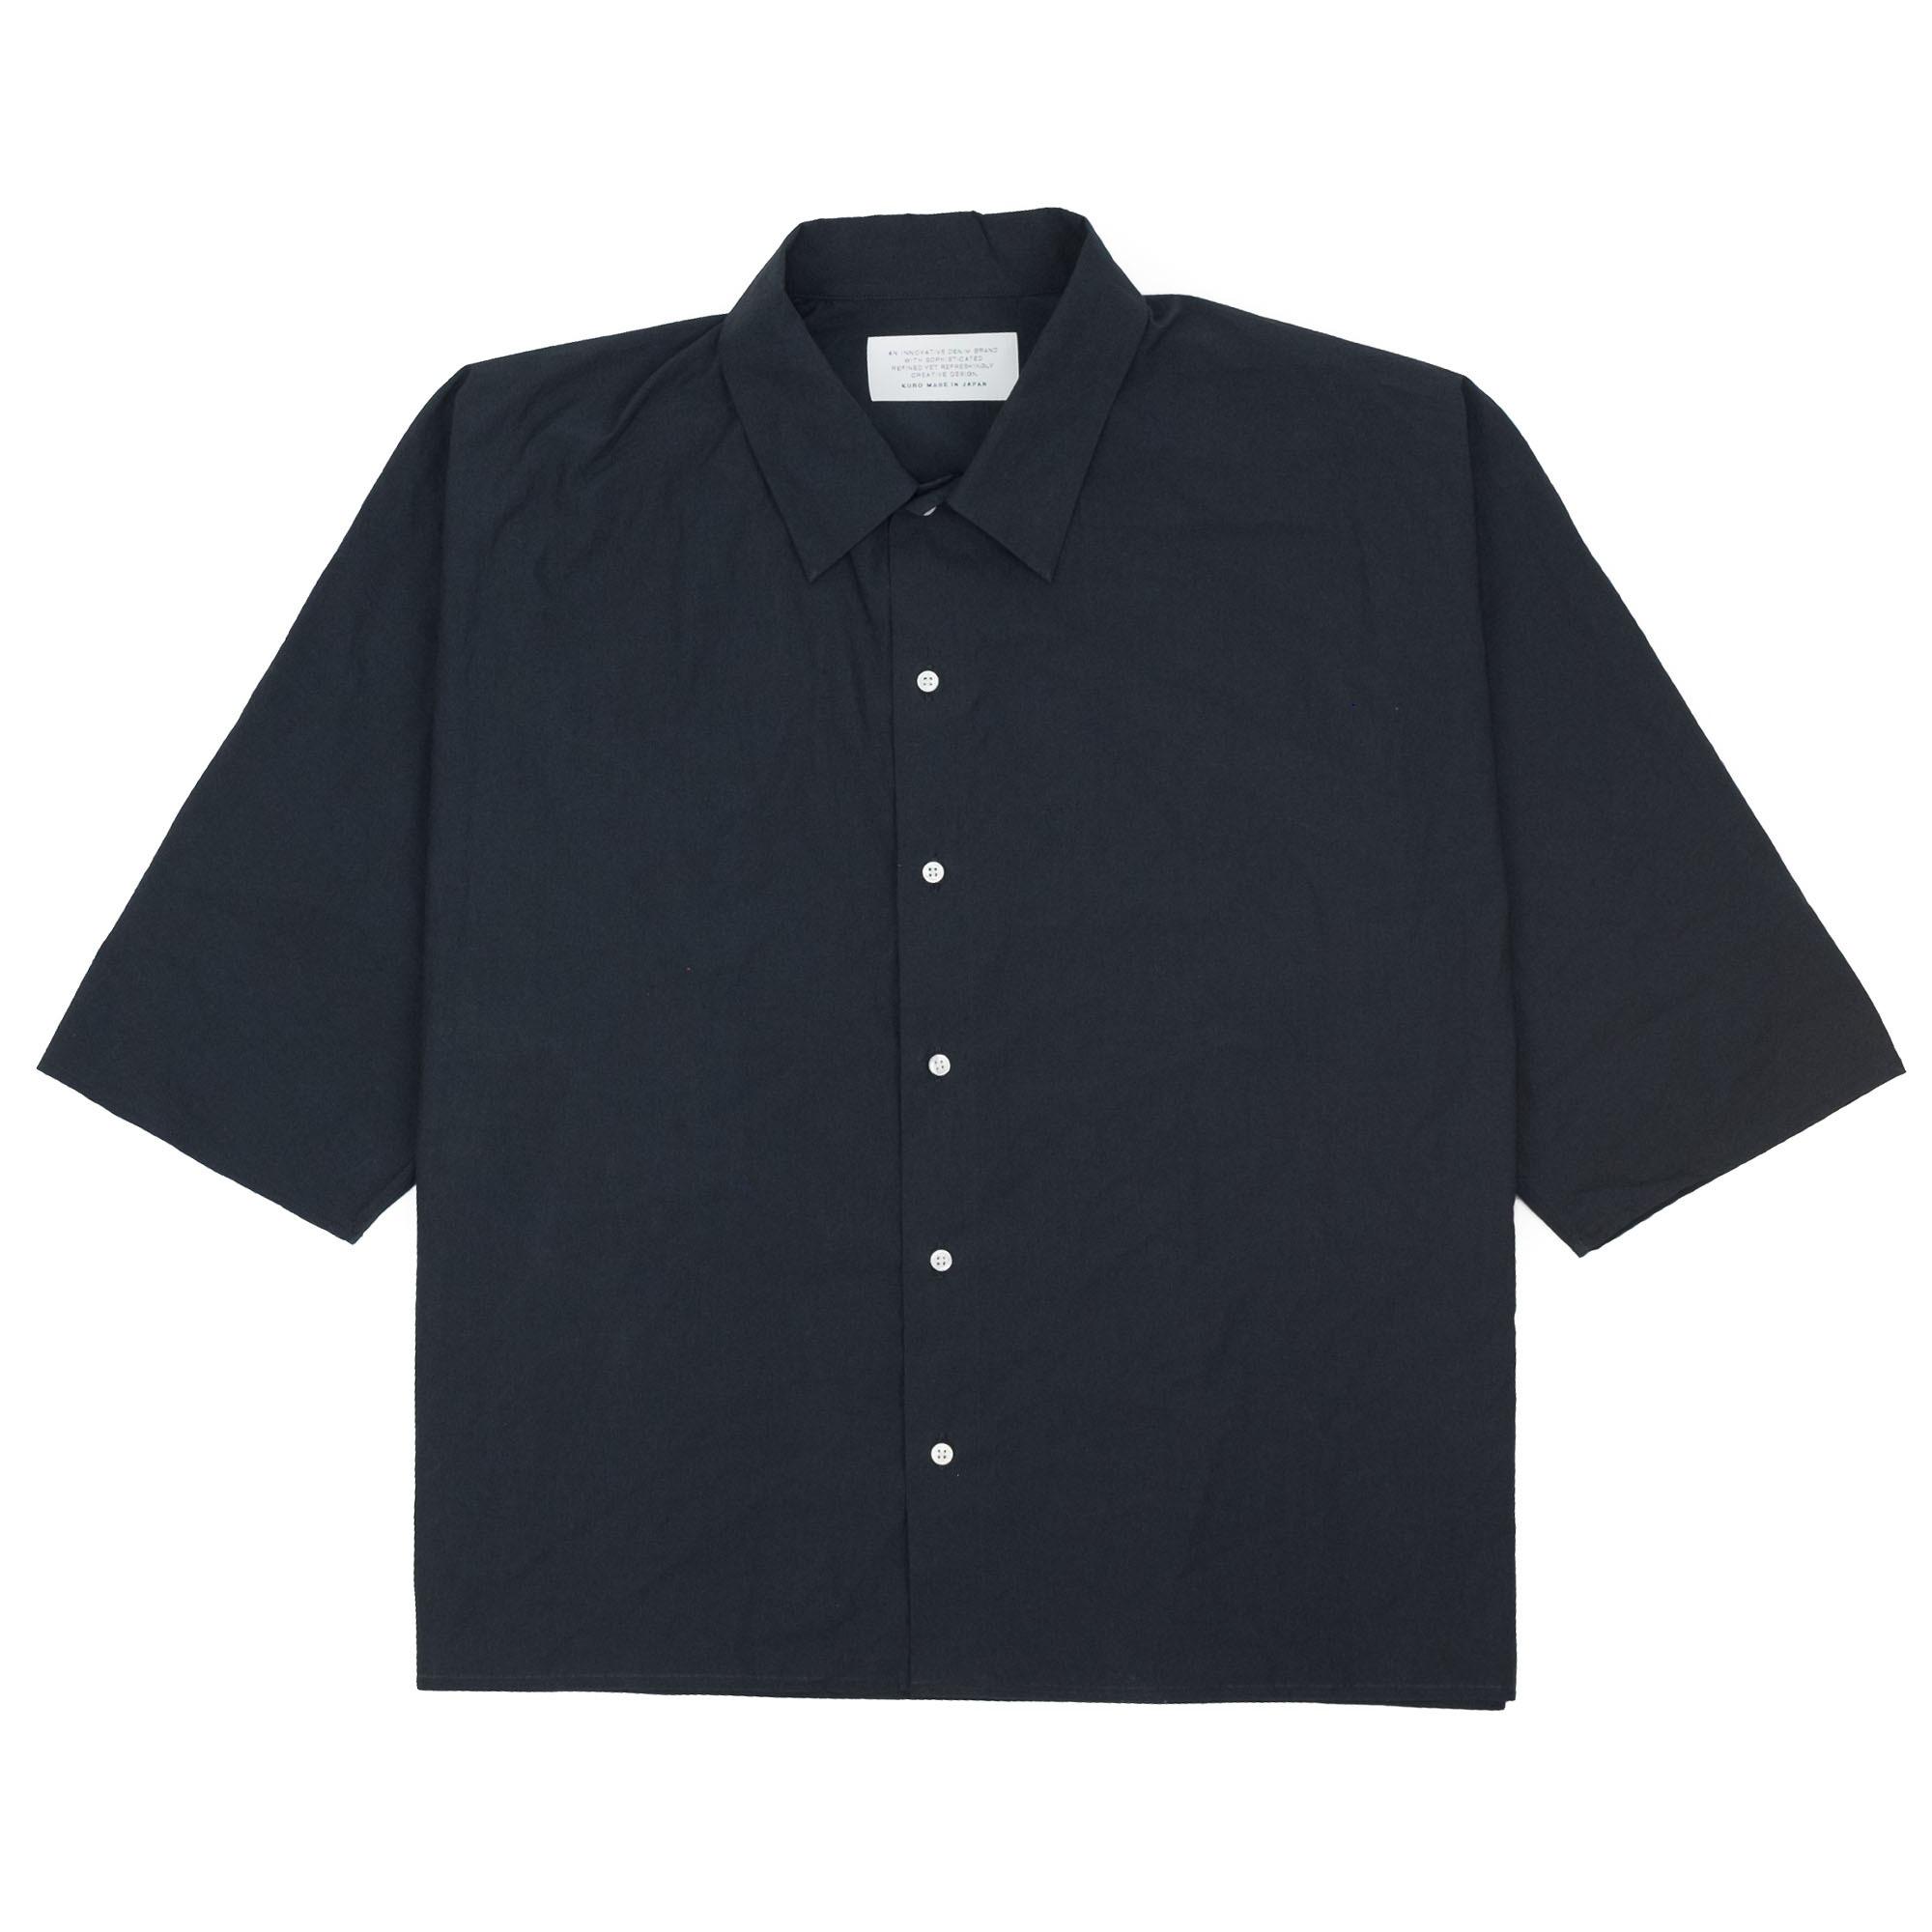 Dolman Sleeve S-S Shirt Black 1